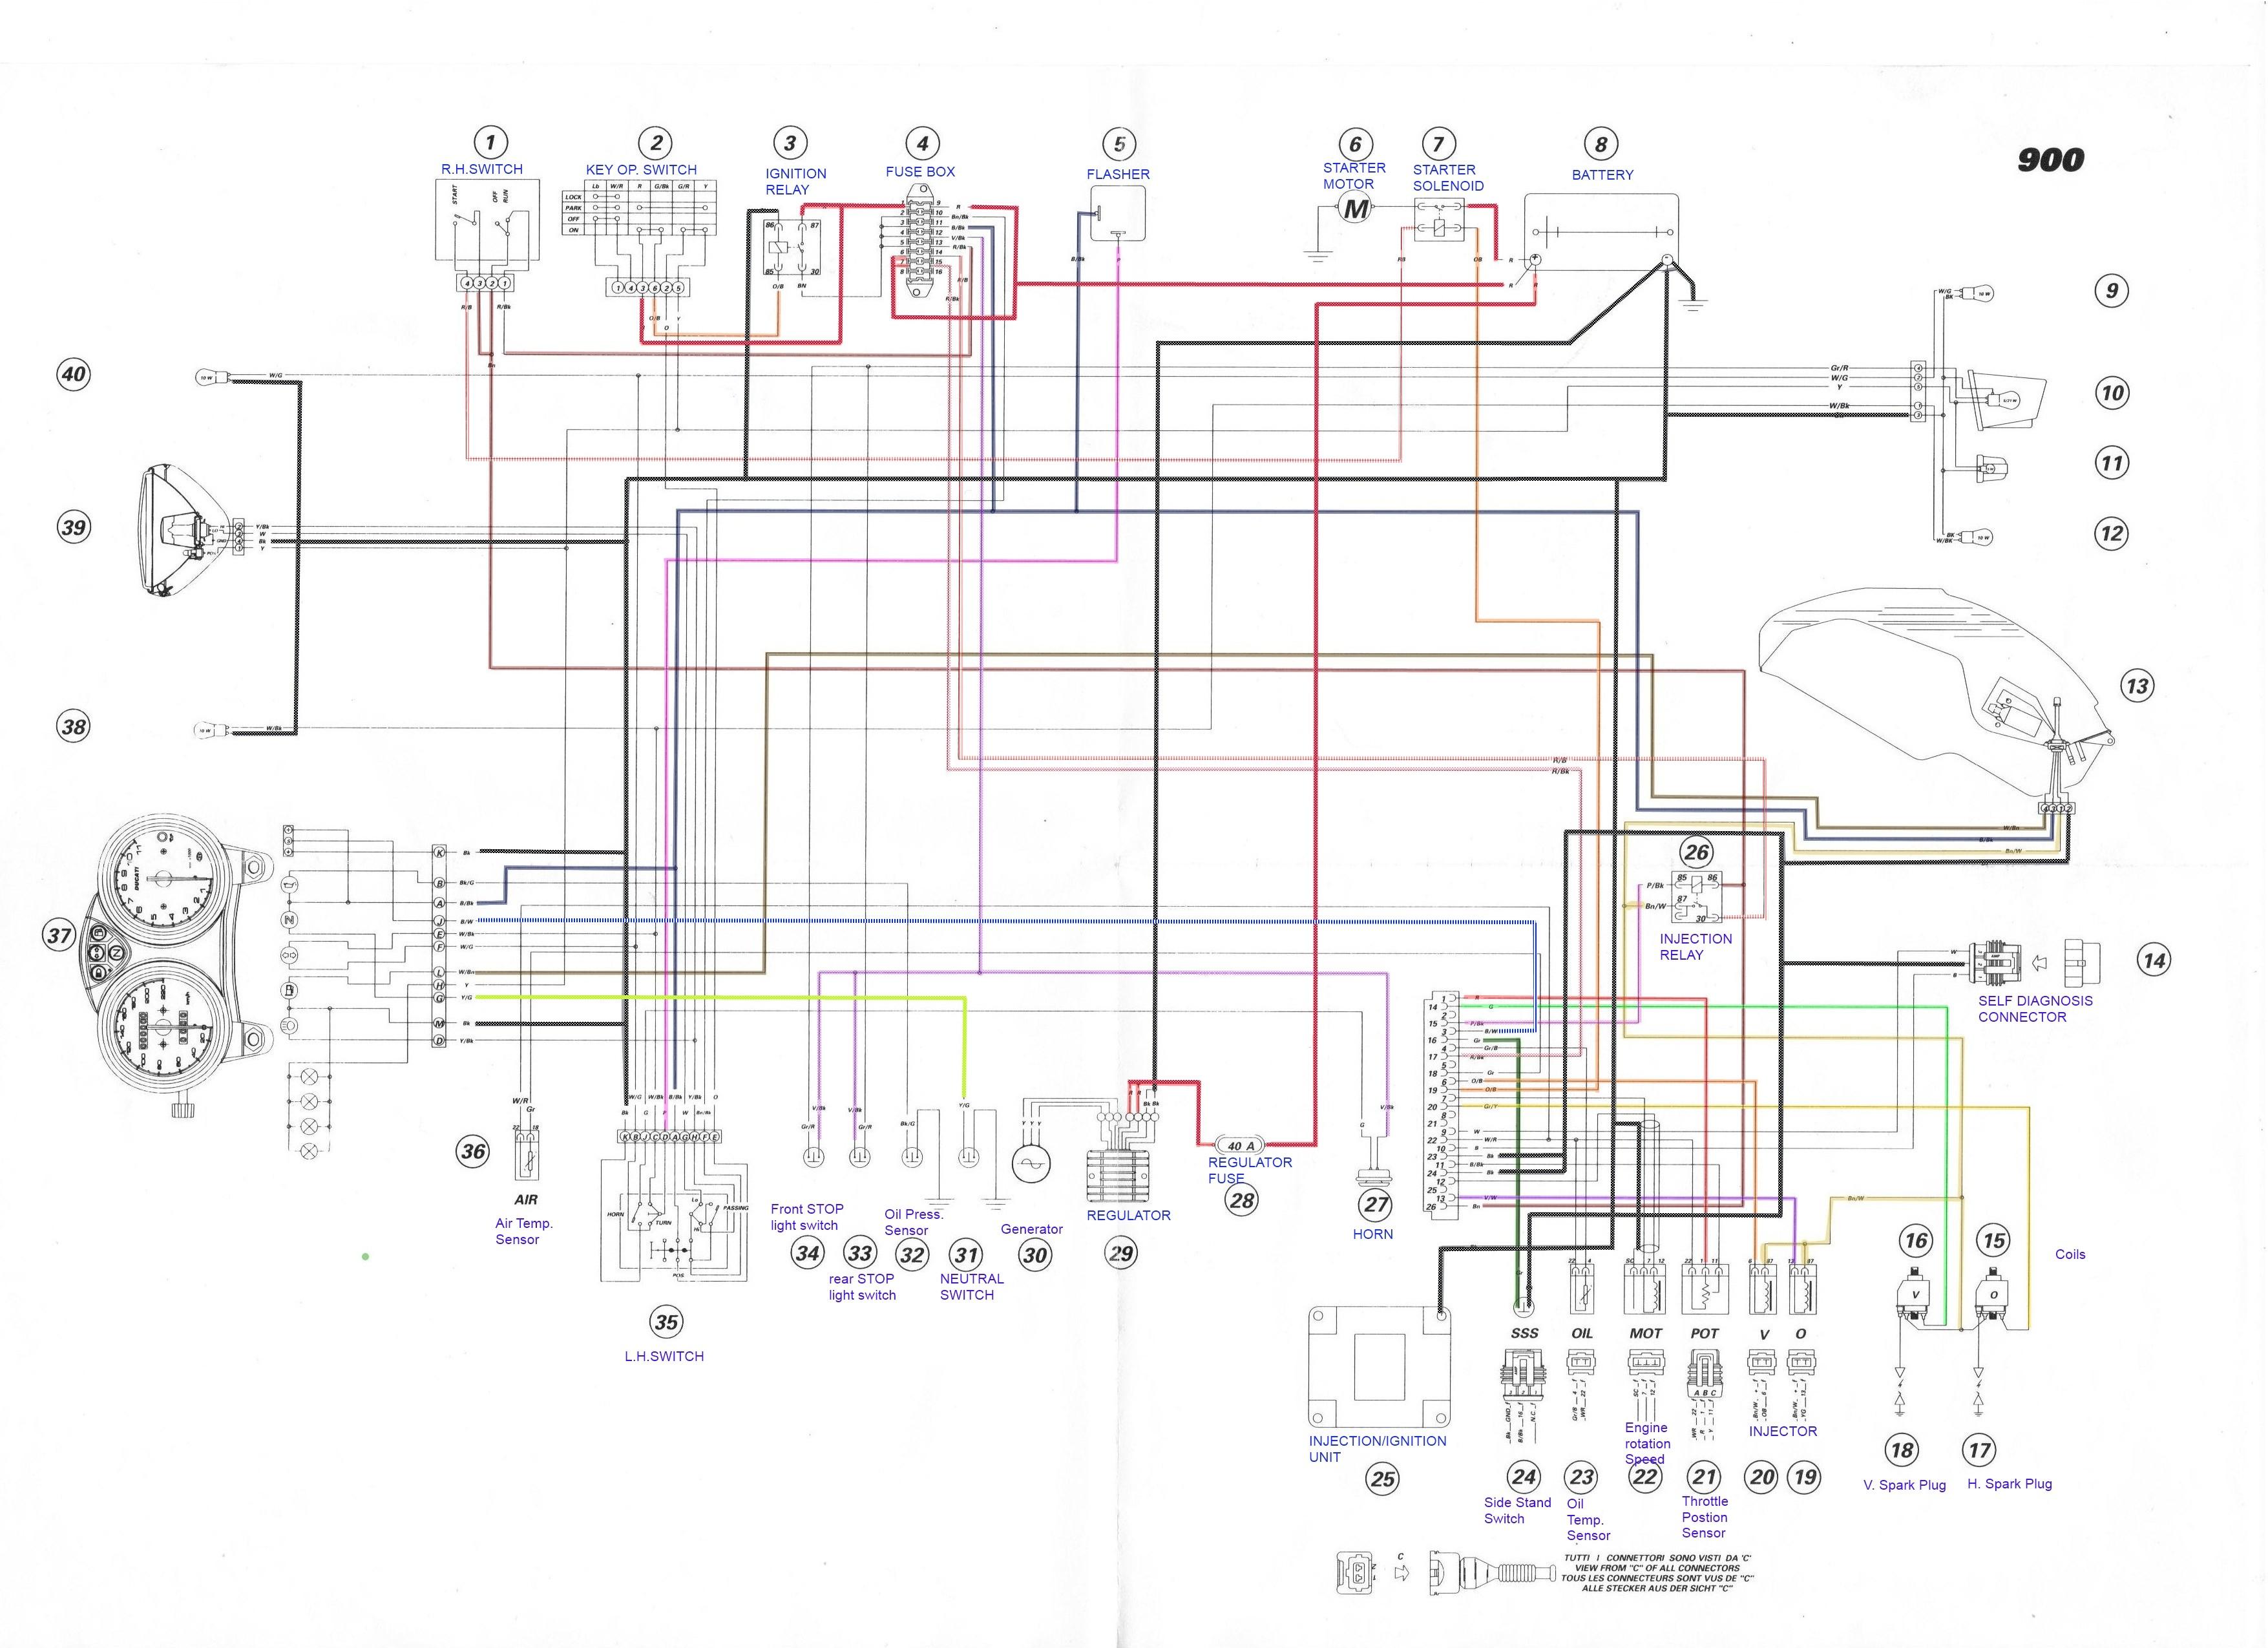 ducati regulator wiring diagram free download u2022 oasis dl co rh oasis dl co ducati multistrada 1000 wiring diagram ducati multistrada 1200 wiring diagram